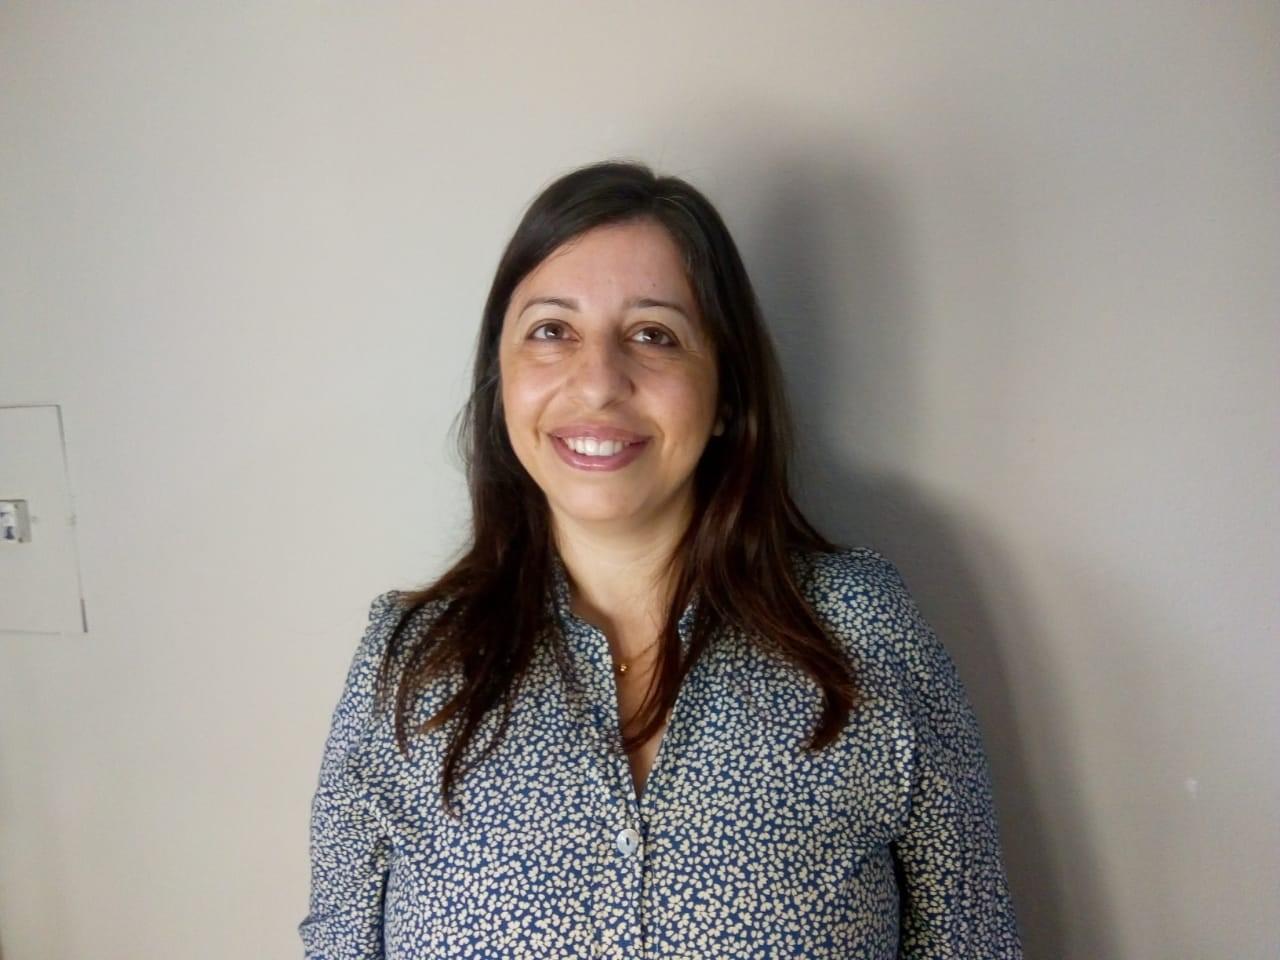 Griselda Troyano